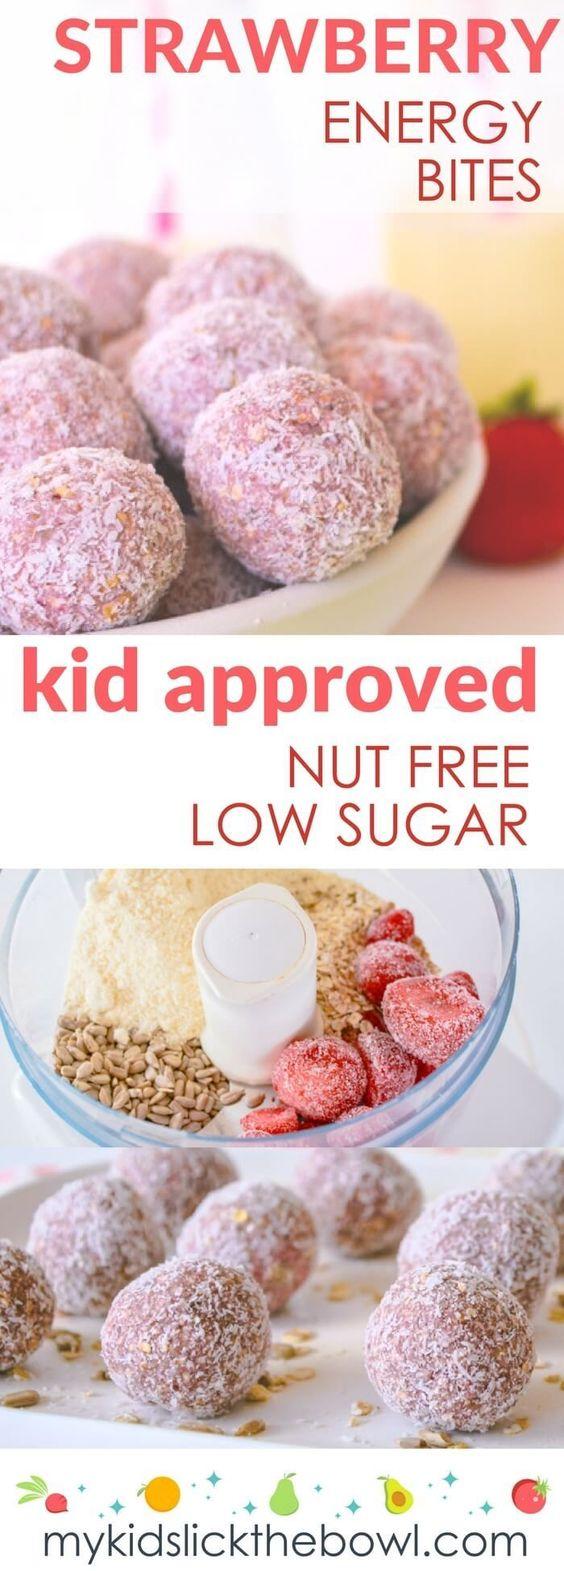 Strawberry Breakfast Bites #strawberry #breakfastrecipes #bites #healthysnack #healthyfood #healthyrecipes #snackrecipes